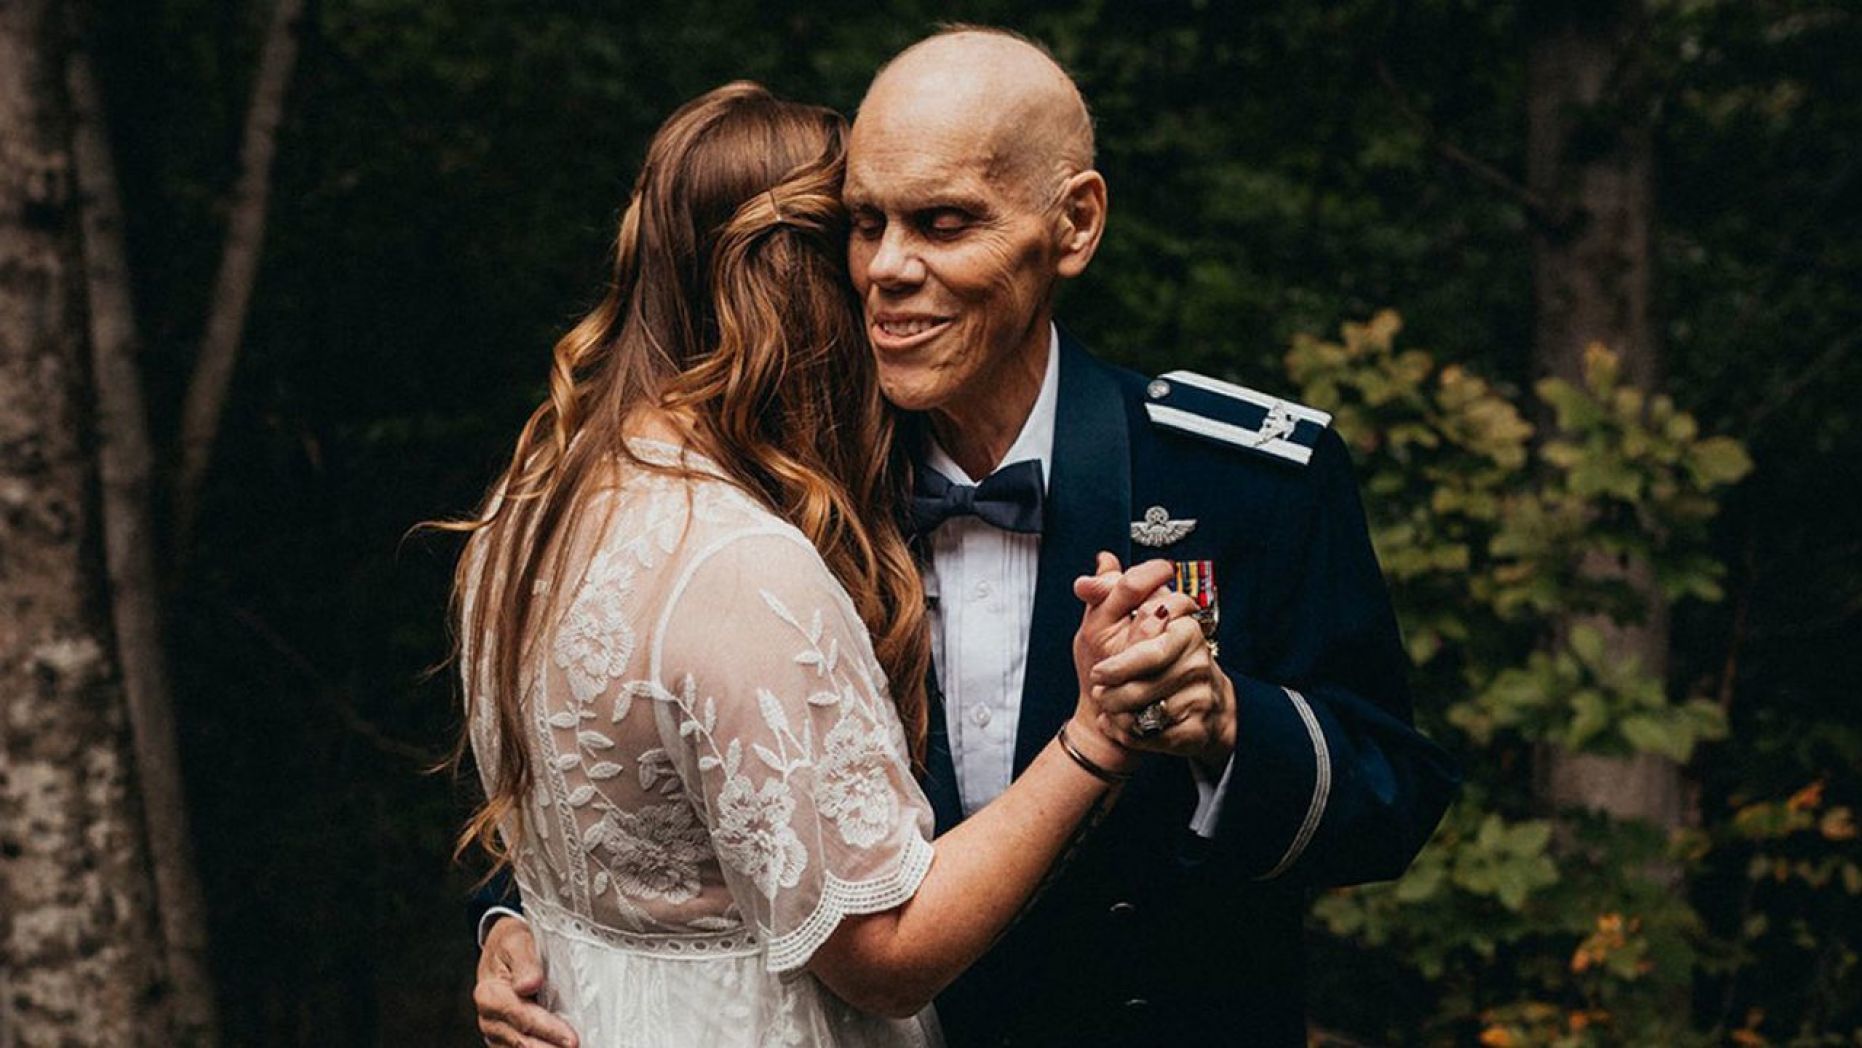 Bride-Father-2_1555611314103.jpg